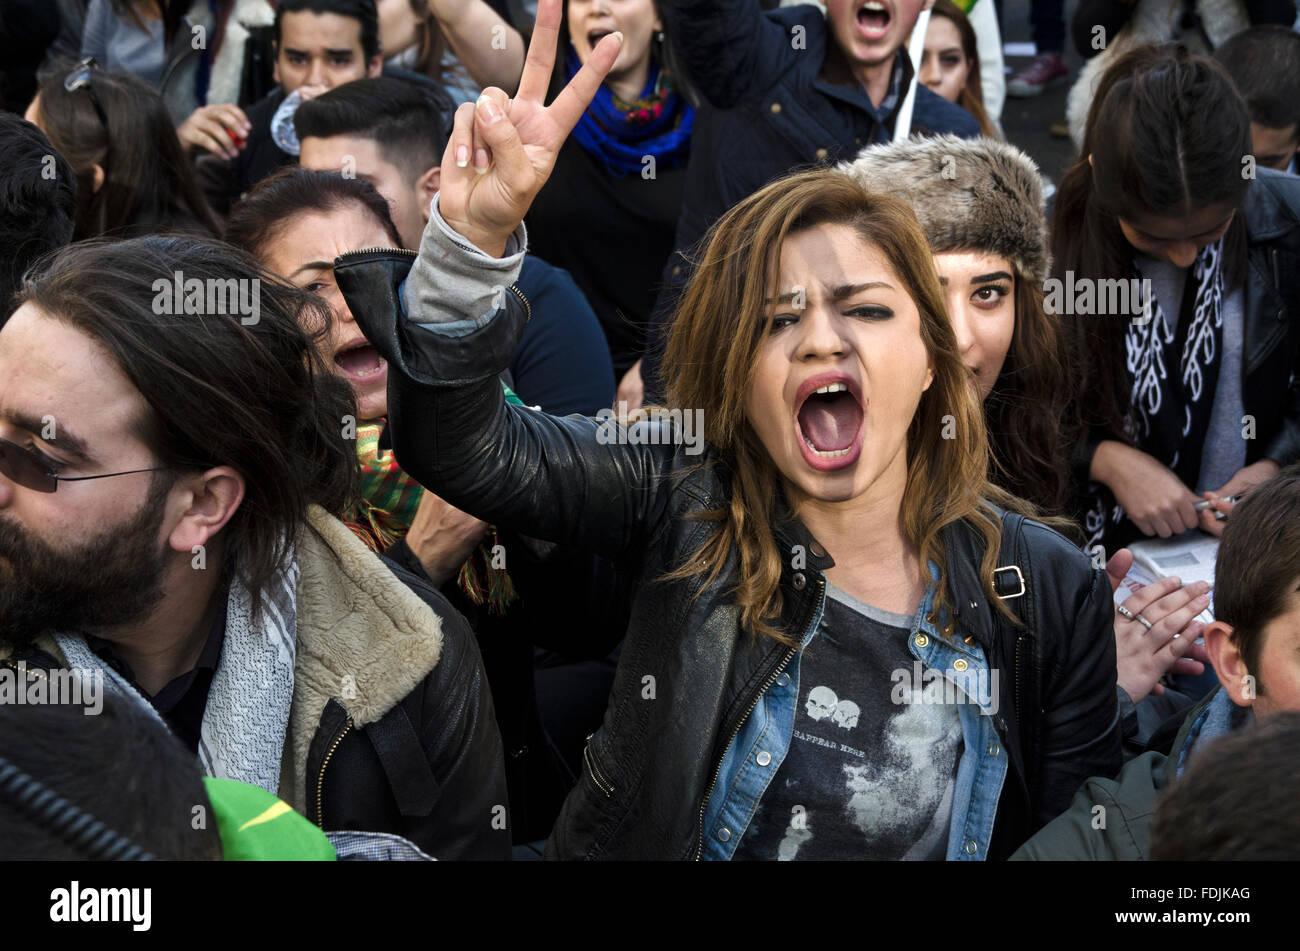 Hembra manifestante kurdo Kobane gritar durante las protestas en Londres Imagen De Stock